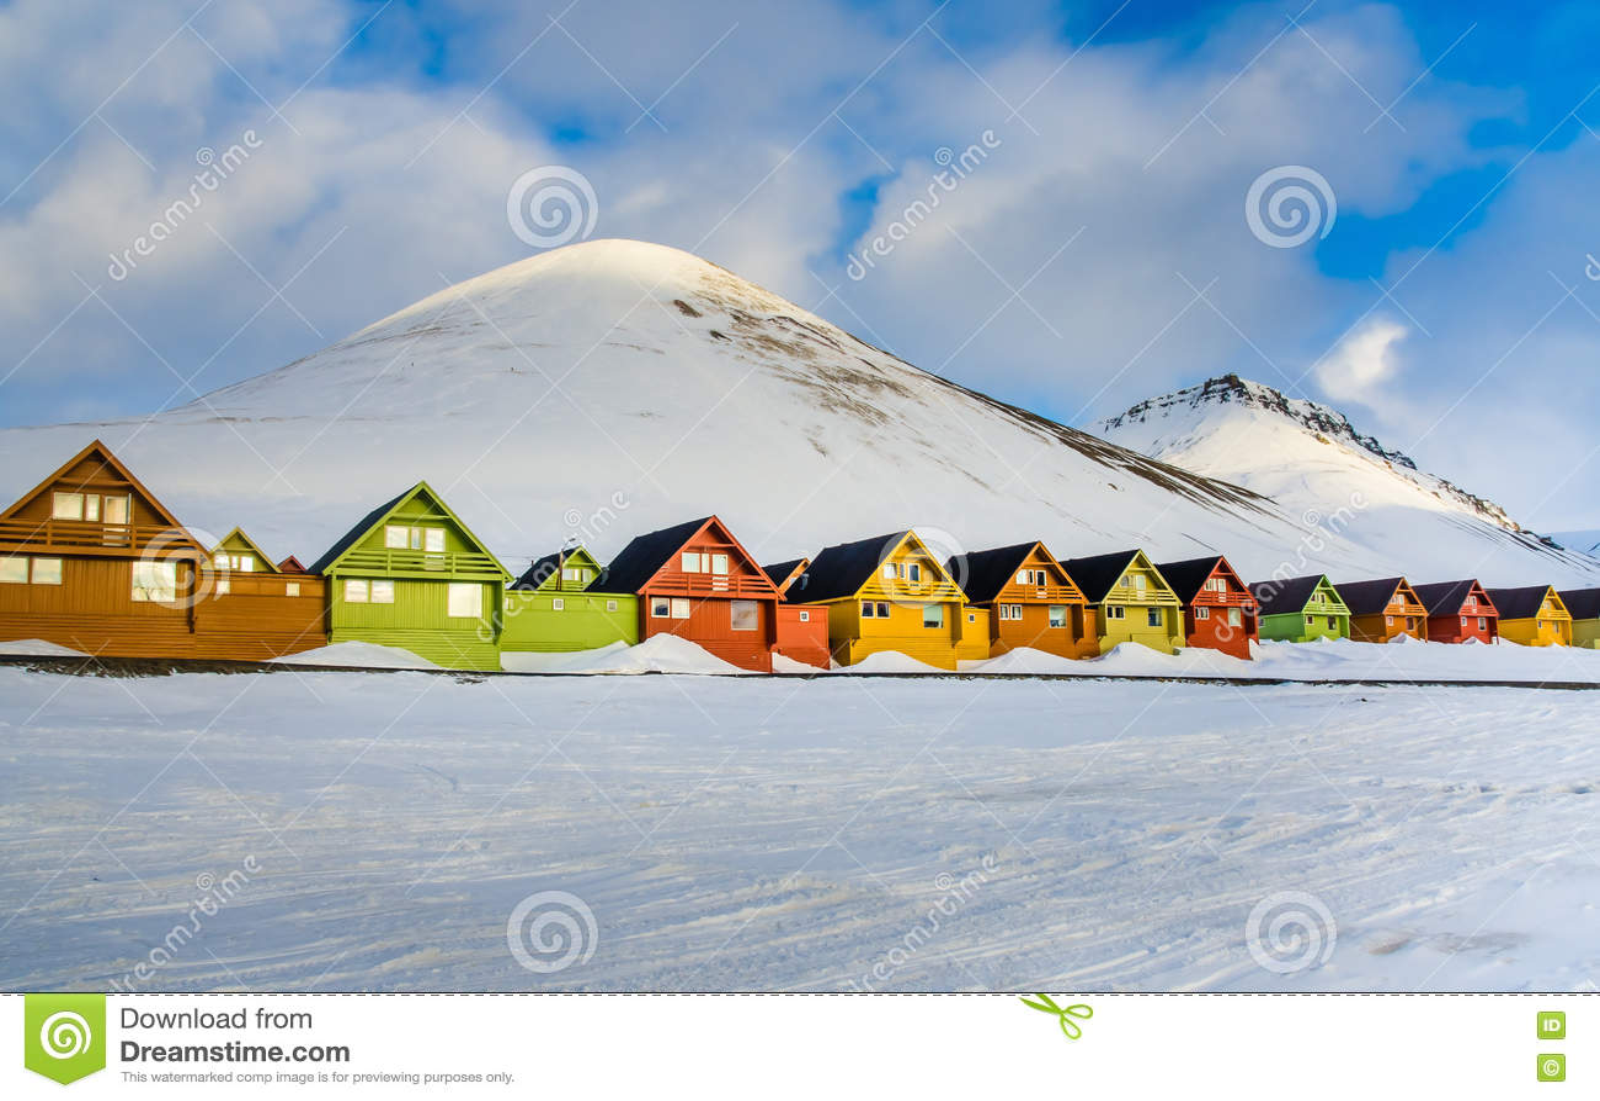 Colorful houses, Longyearbyen, Spitsbergen, Svalbard, Norway